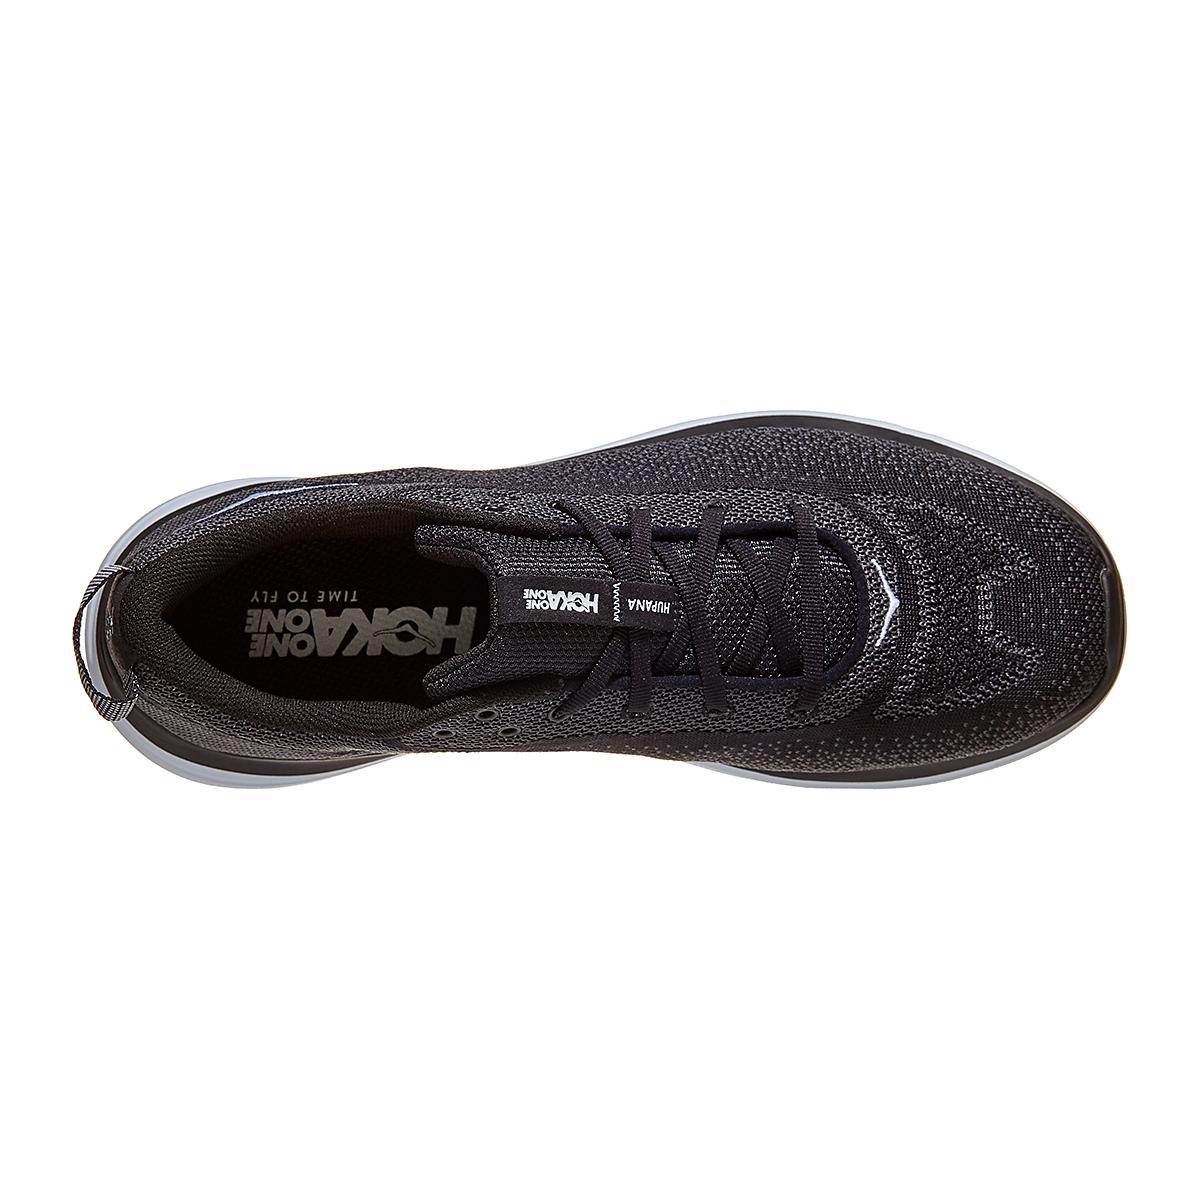 Men's Hoka One One Hupana Flow Running Shoe - Color: Black/ Dark Shadow - Size: 7 - Width: Wide, Black/ Dark Shadow, large, image 3